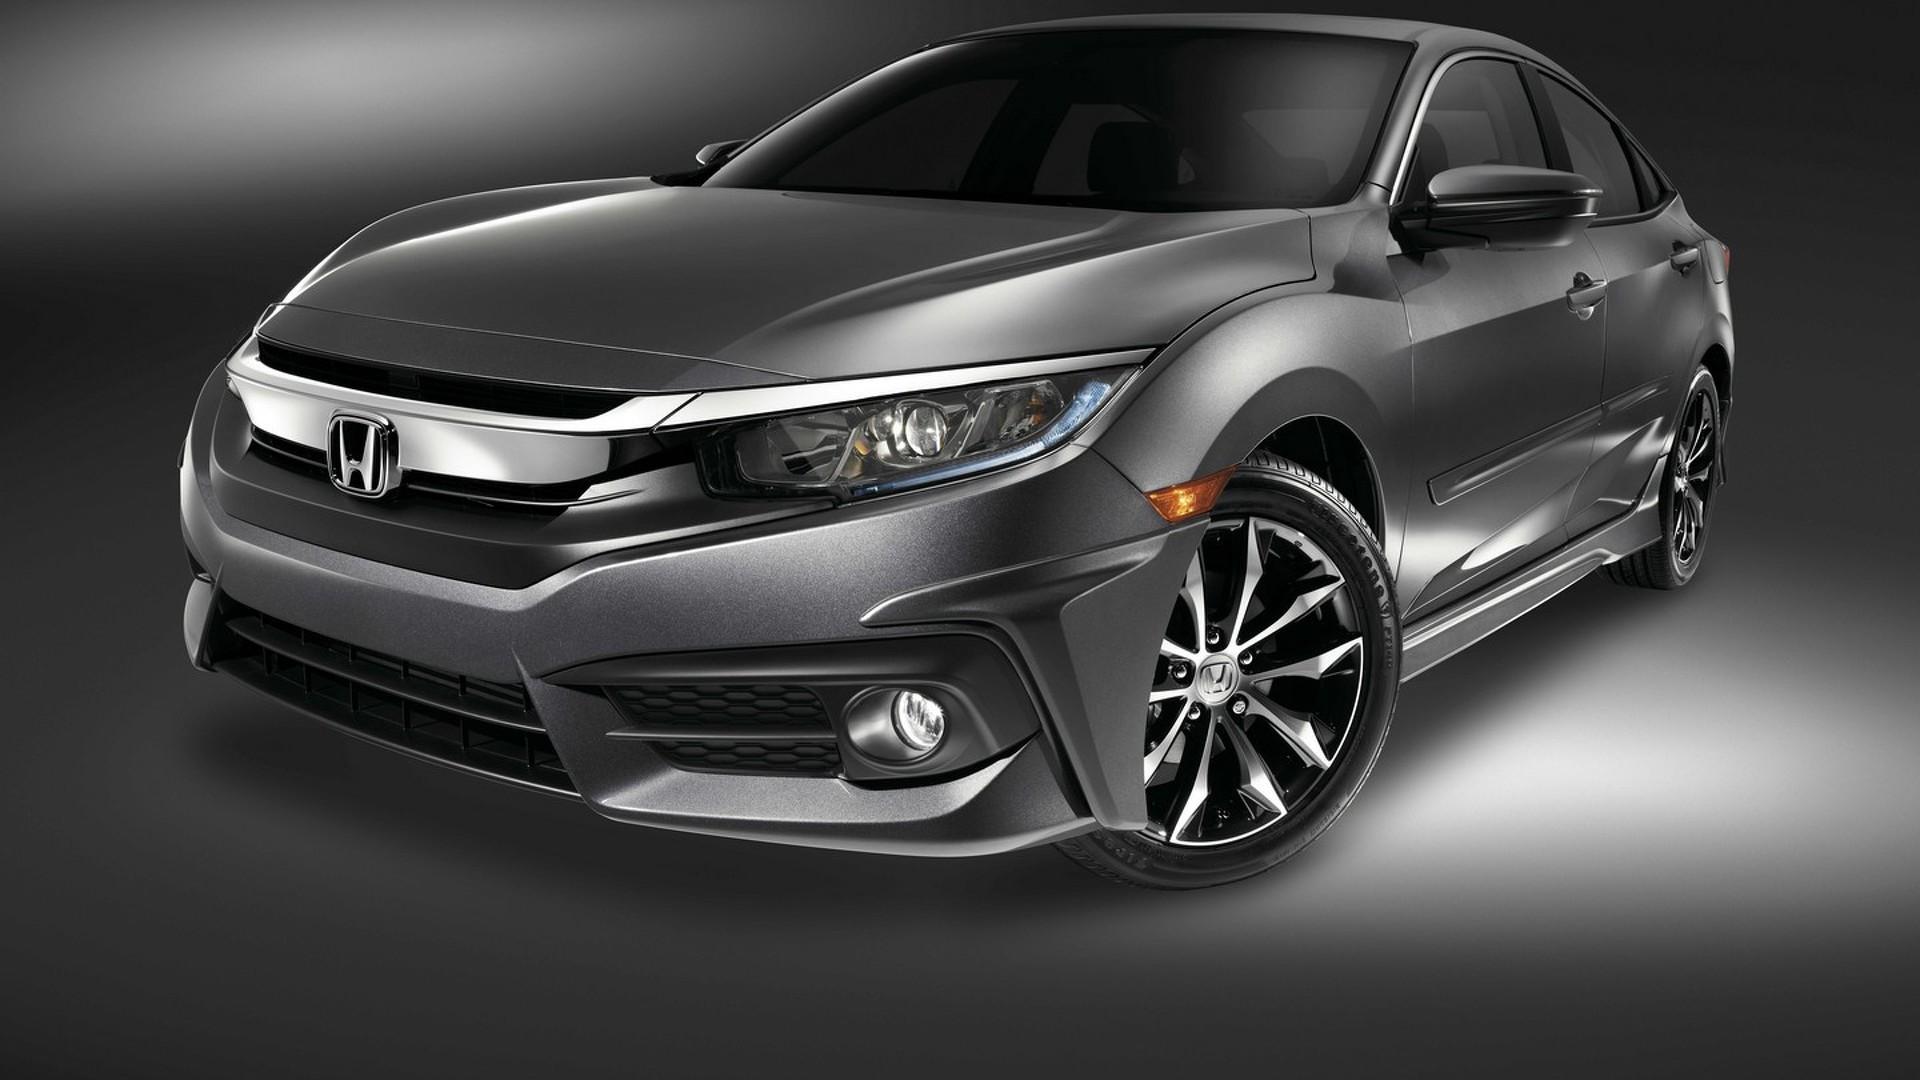 Honda brings 2016 Civic Sedan to SEMA with subtle body kit